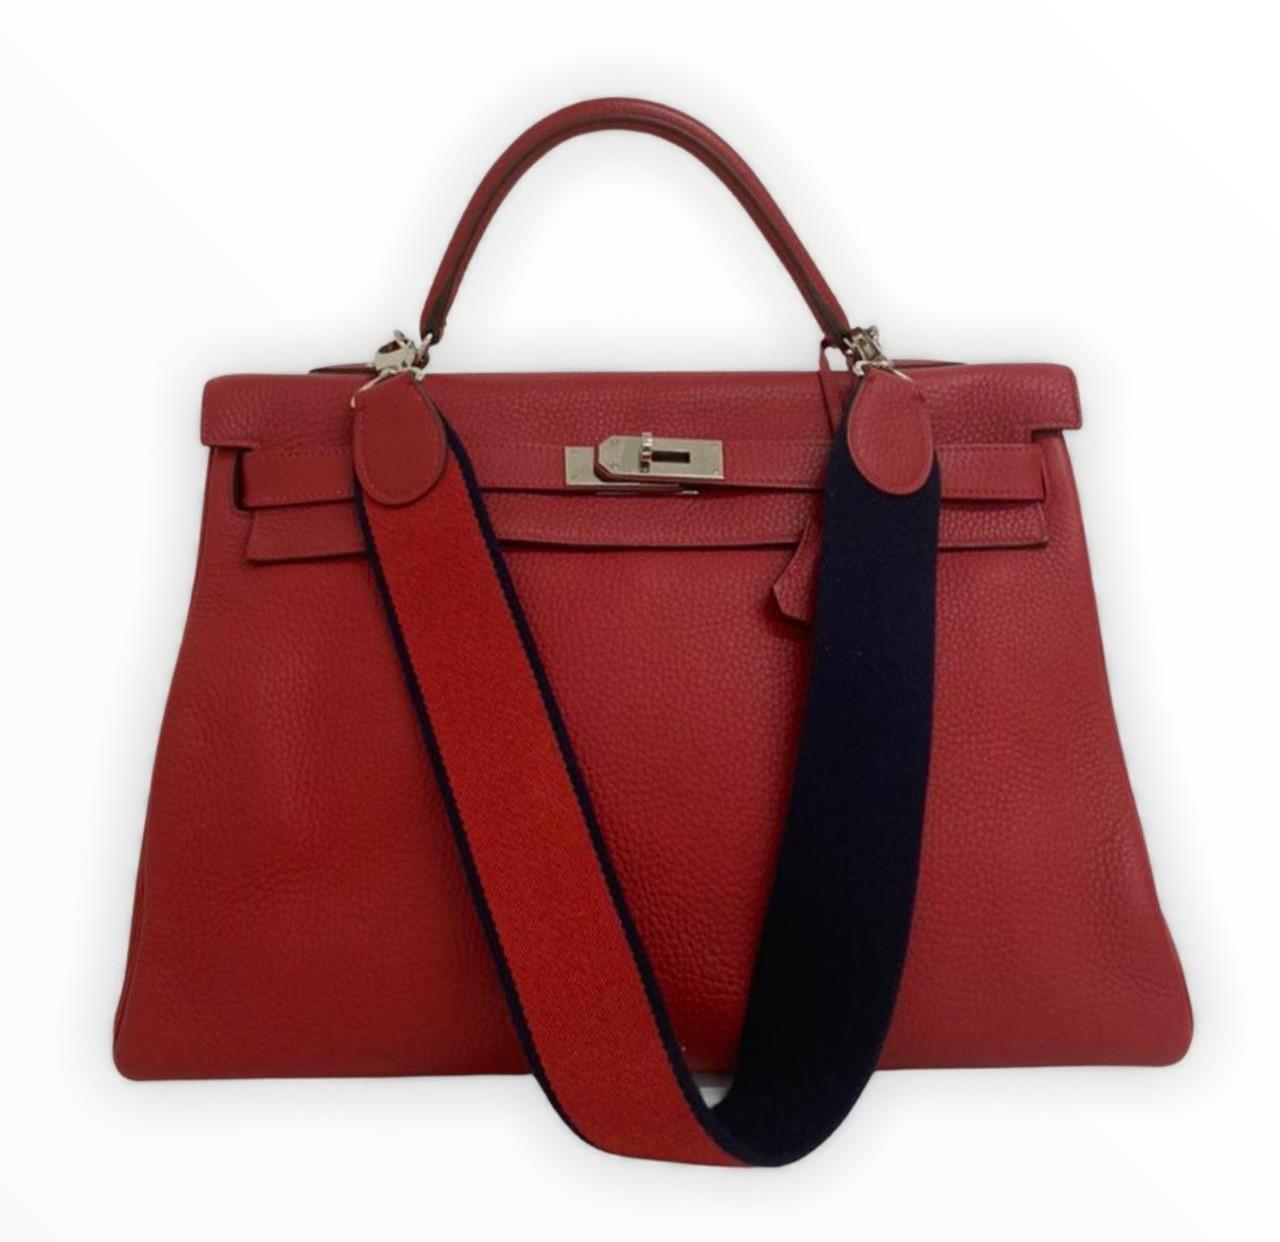 Bolsa Hermès Kelly 40 Vermelha